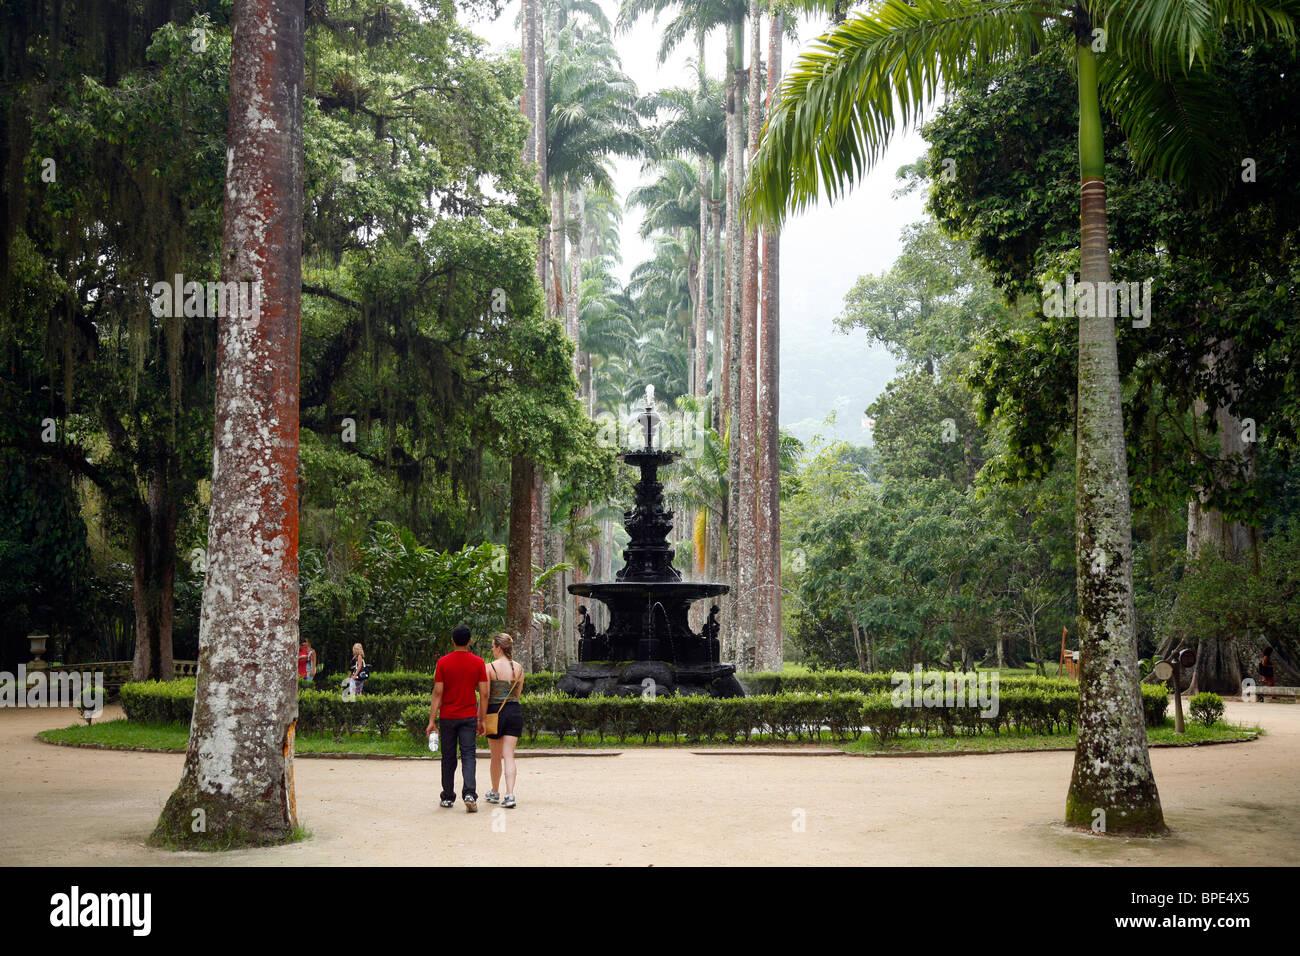 Il Jardim Botanico o i giardini botanici, Rio de Janeiro, Brasile. Immagini Stock